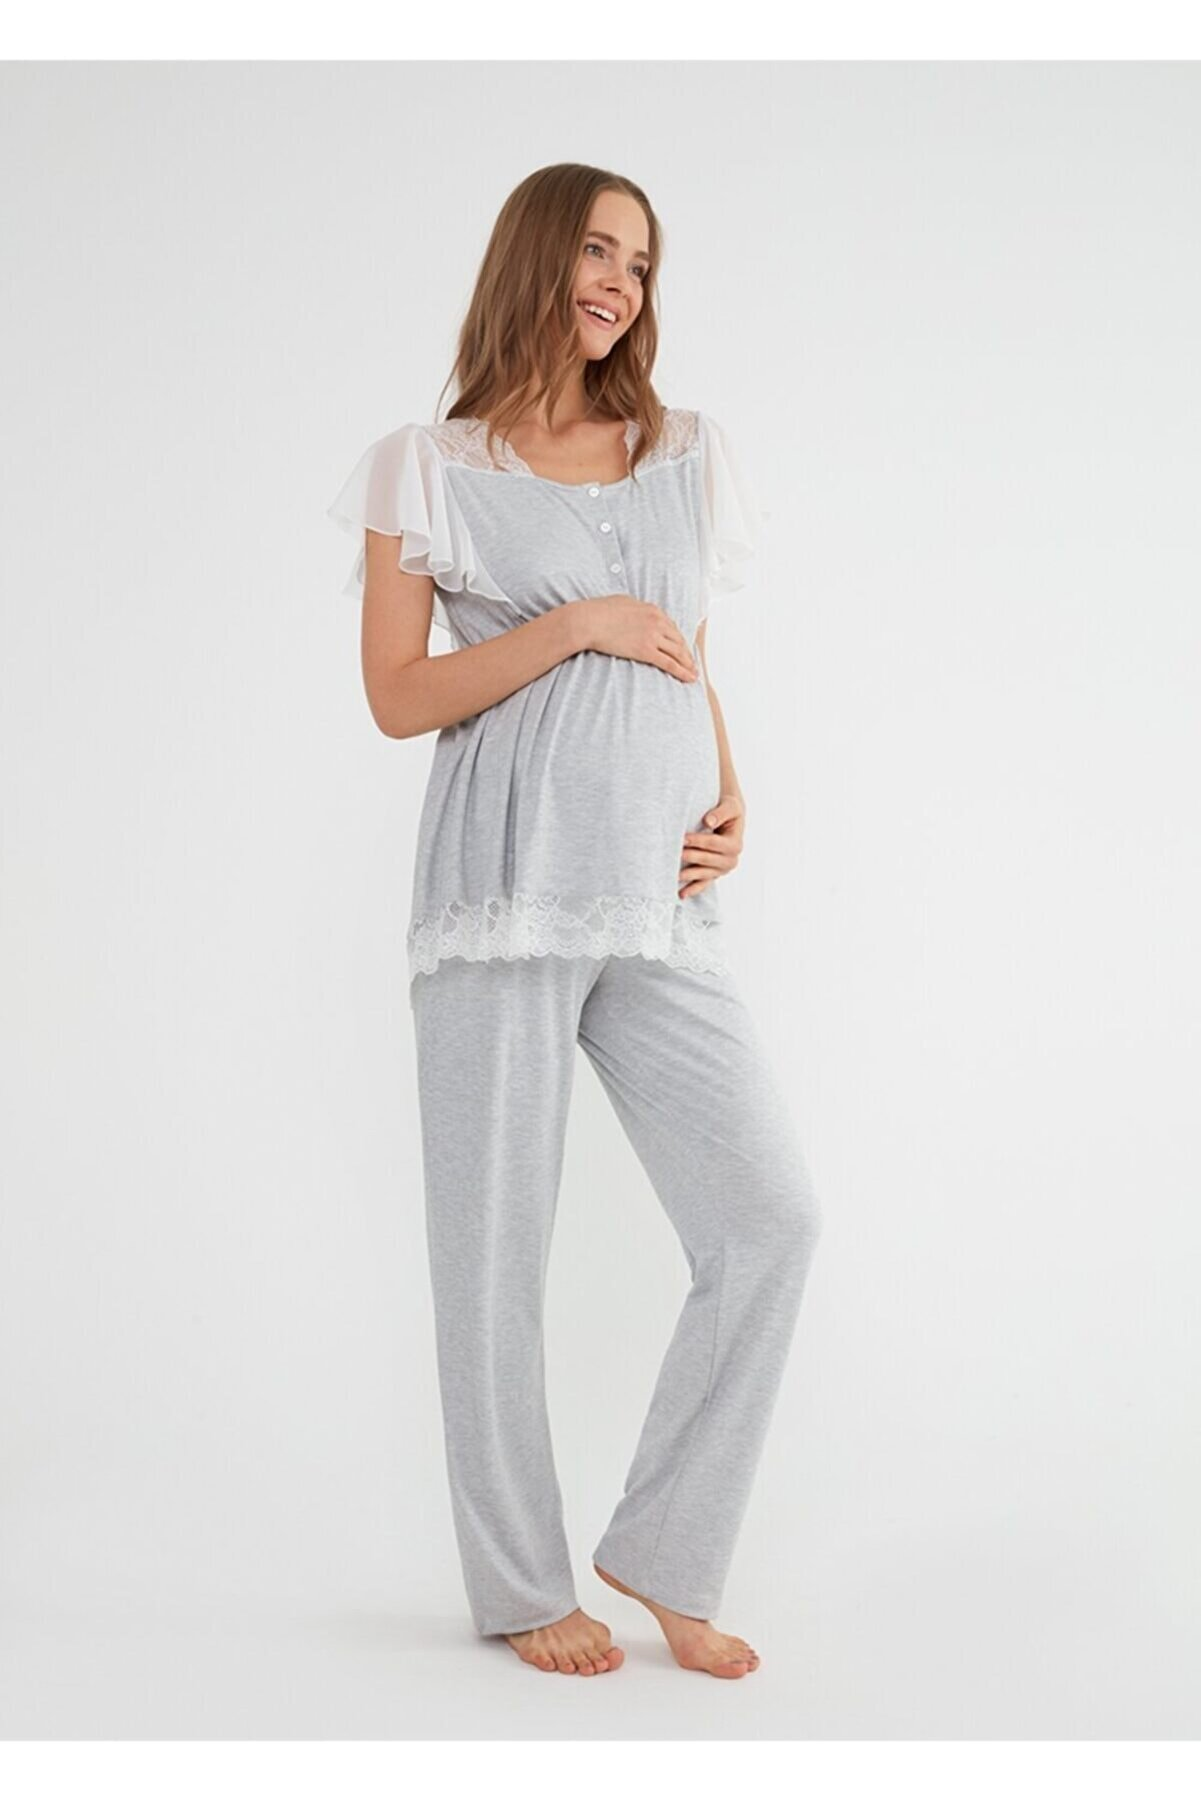 Suwen Mia Hamile Lohusa Pijama Takımı